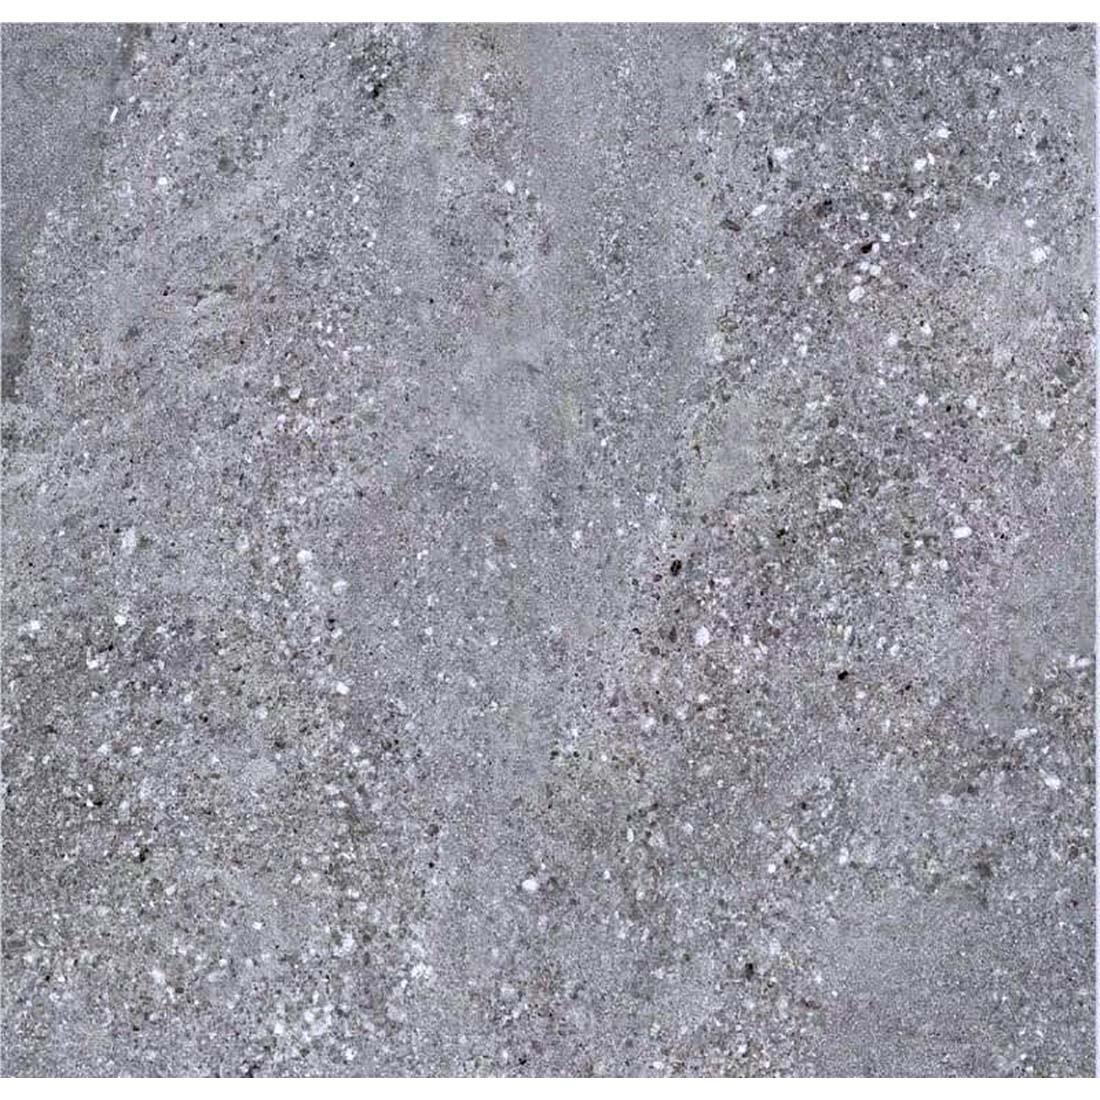 Cristal 60x60 Grey Matt R10 1